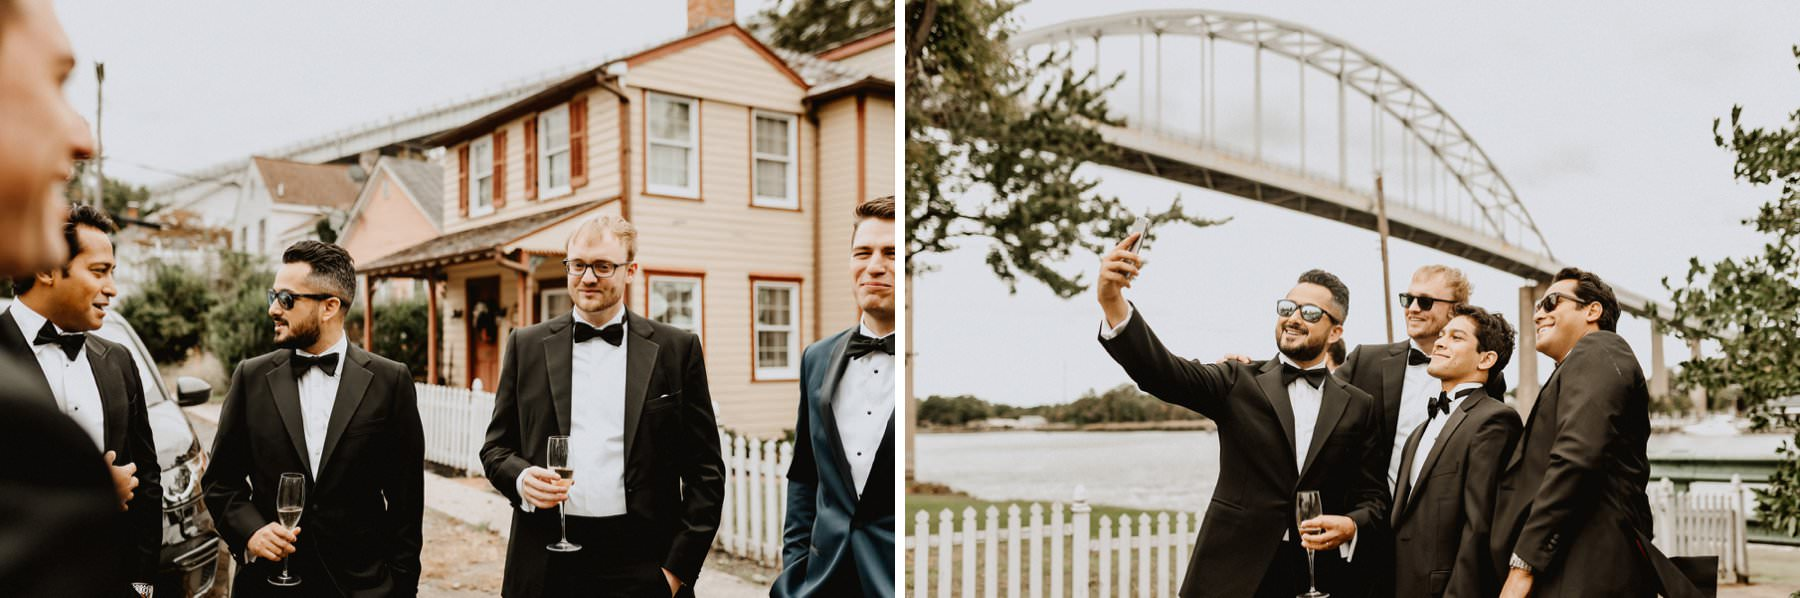 Philadelphia_private_estate_wedding-021.jpg